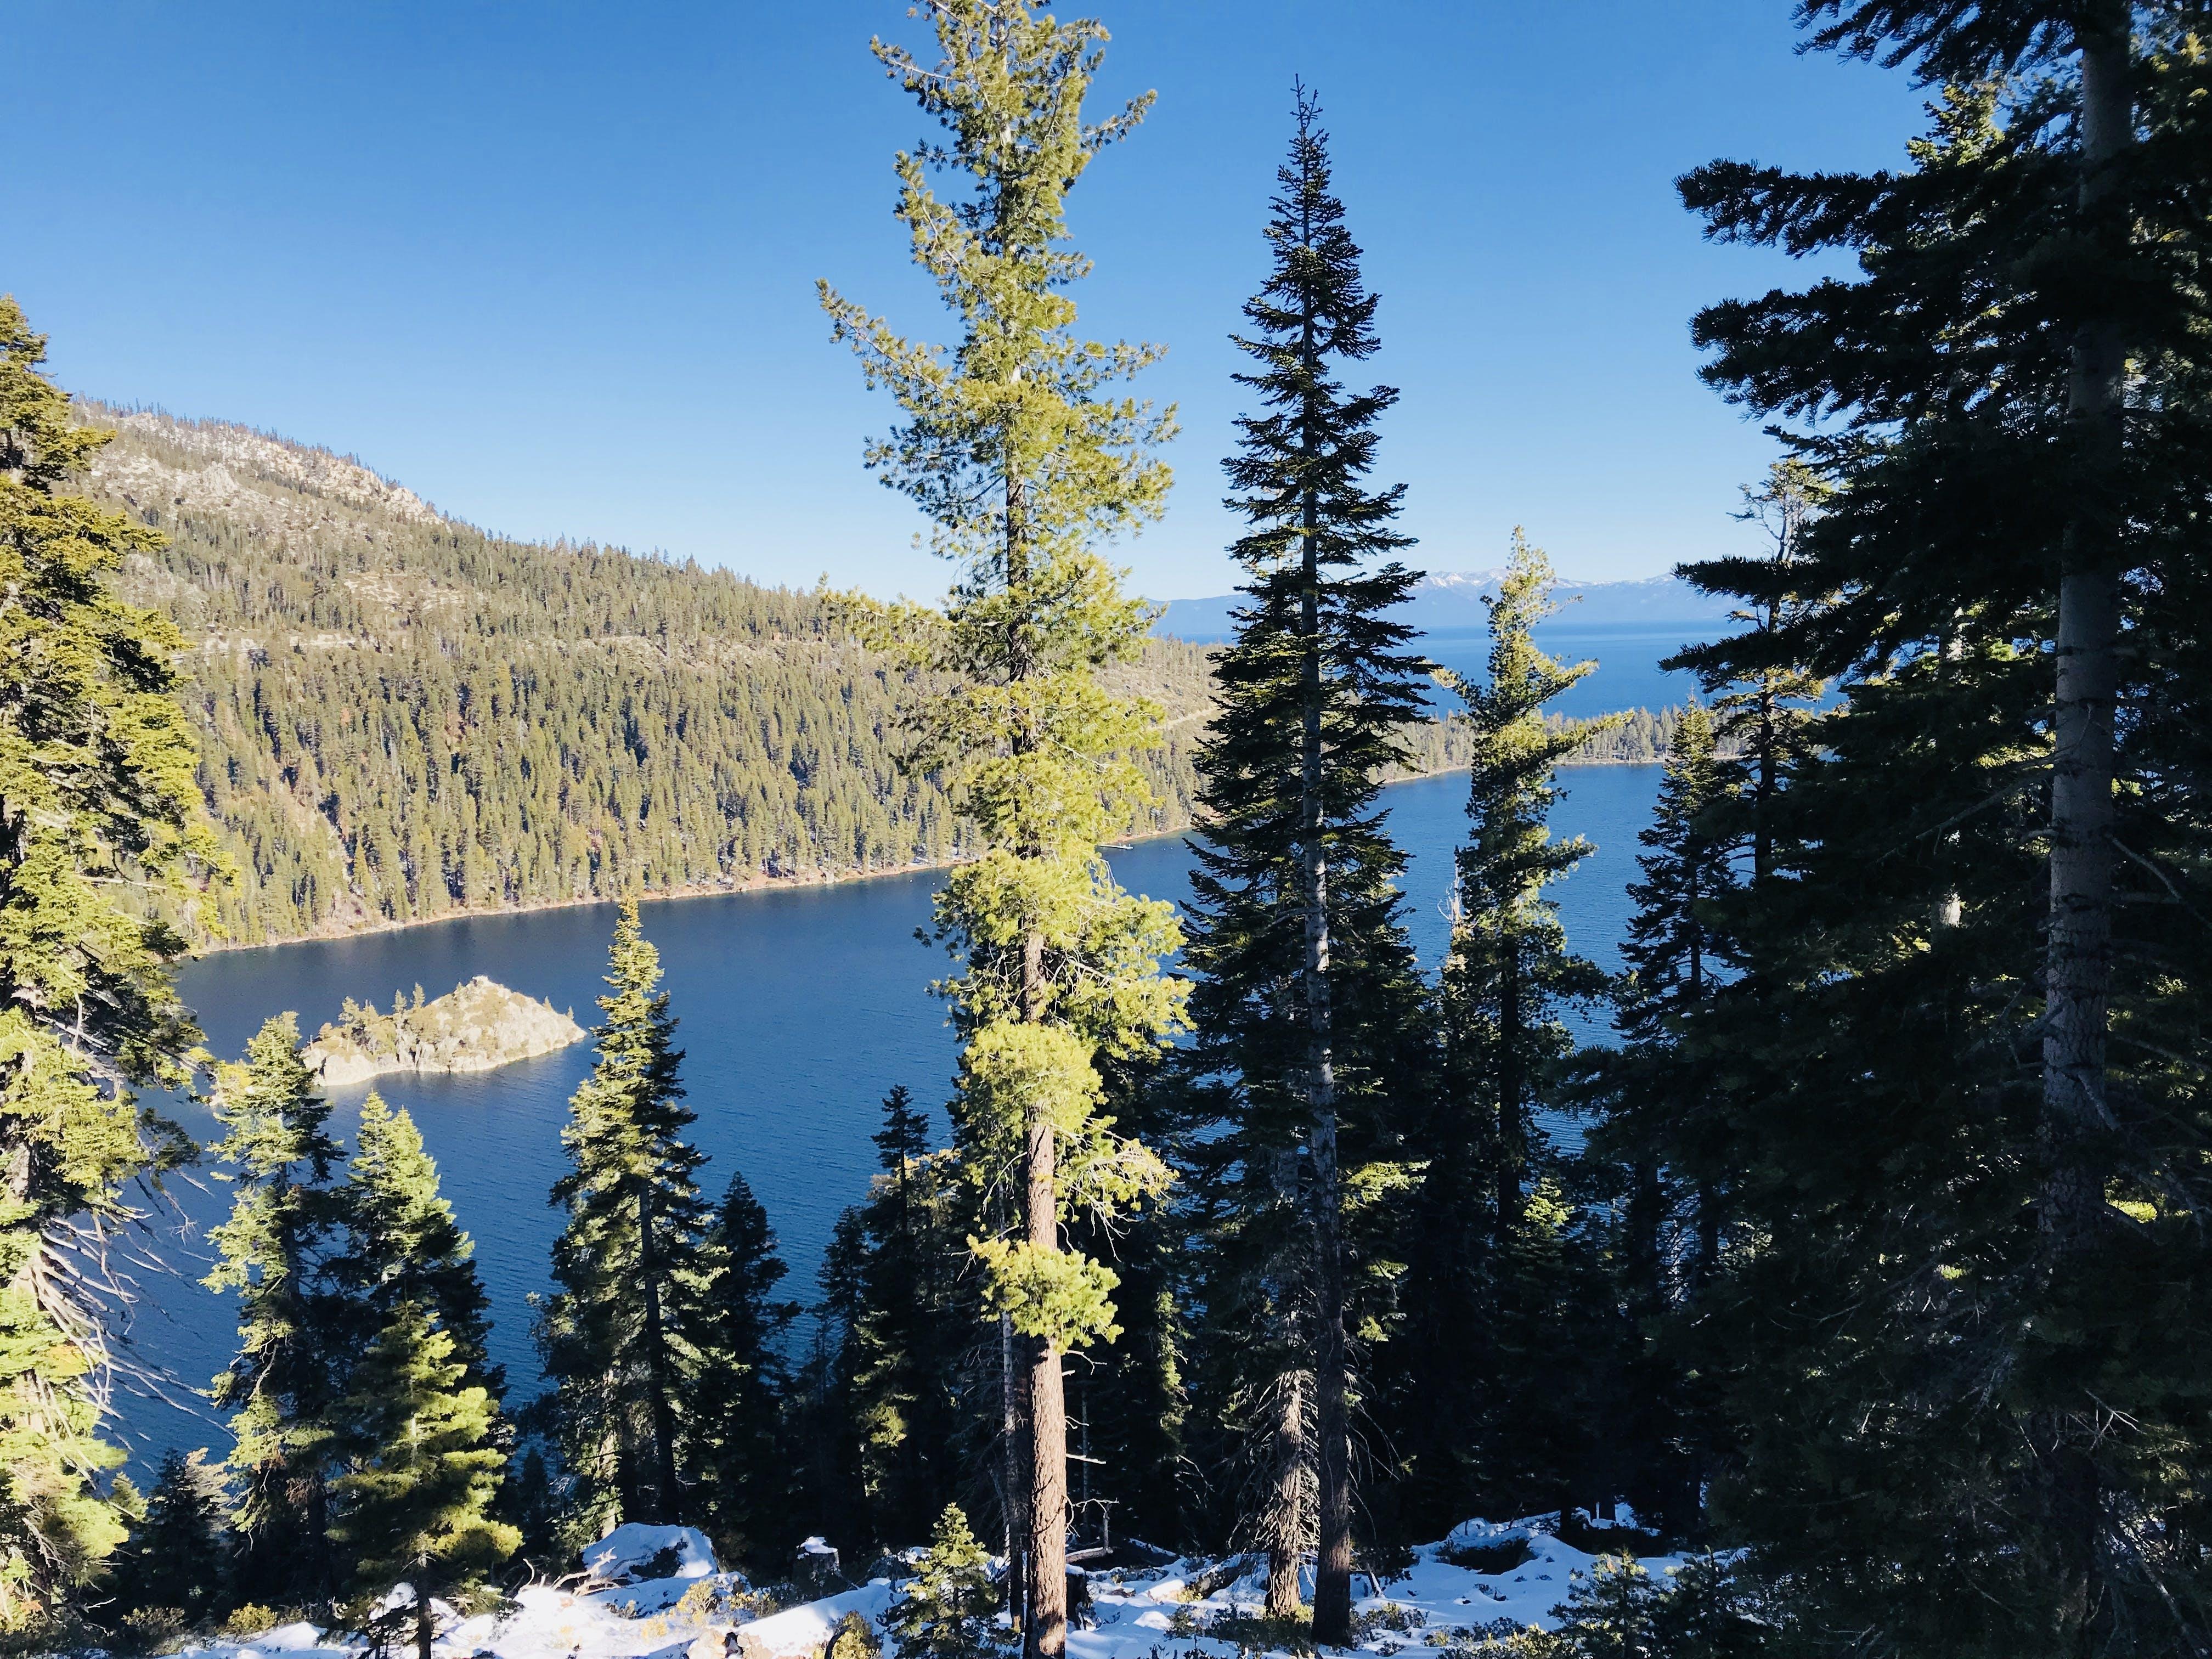 Green Pine Trees and Lake